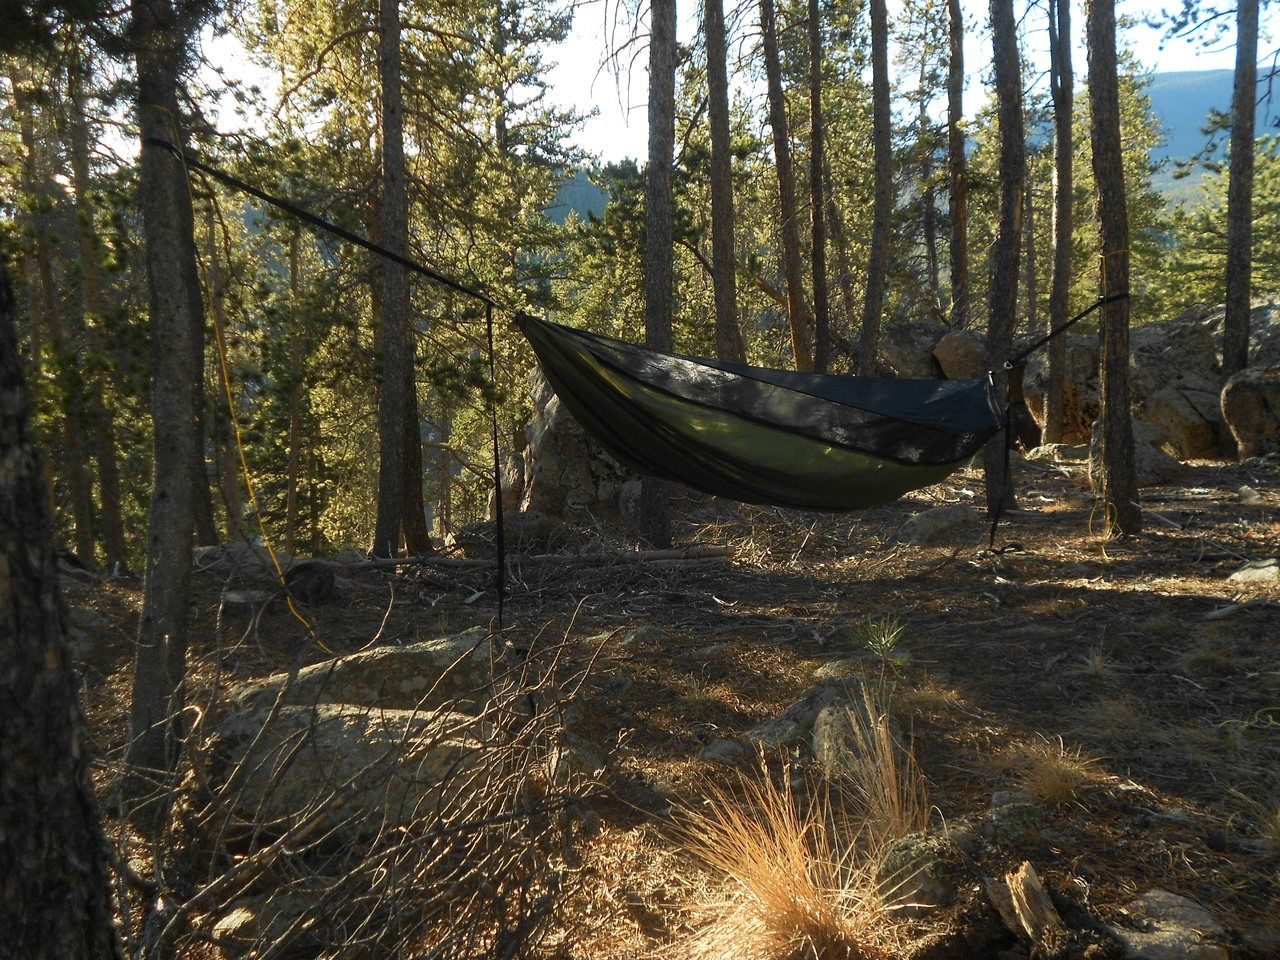 nz gear hammock outdoor web american cactus made magazine wilderness review